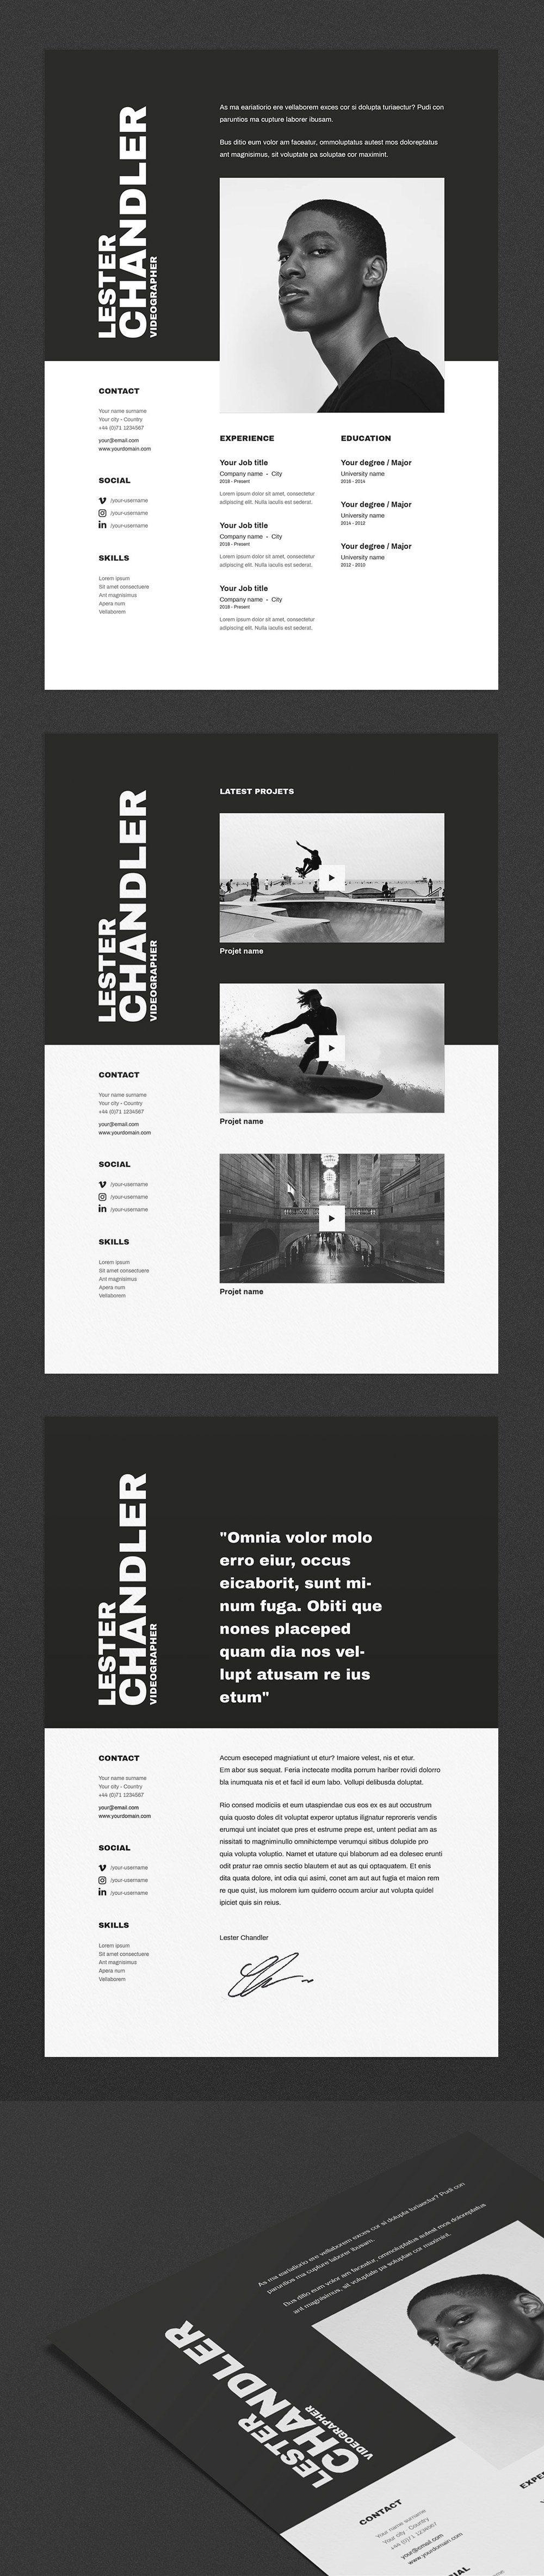 Lester CV / resume template Modèle cv, Modelisme